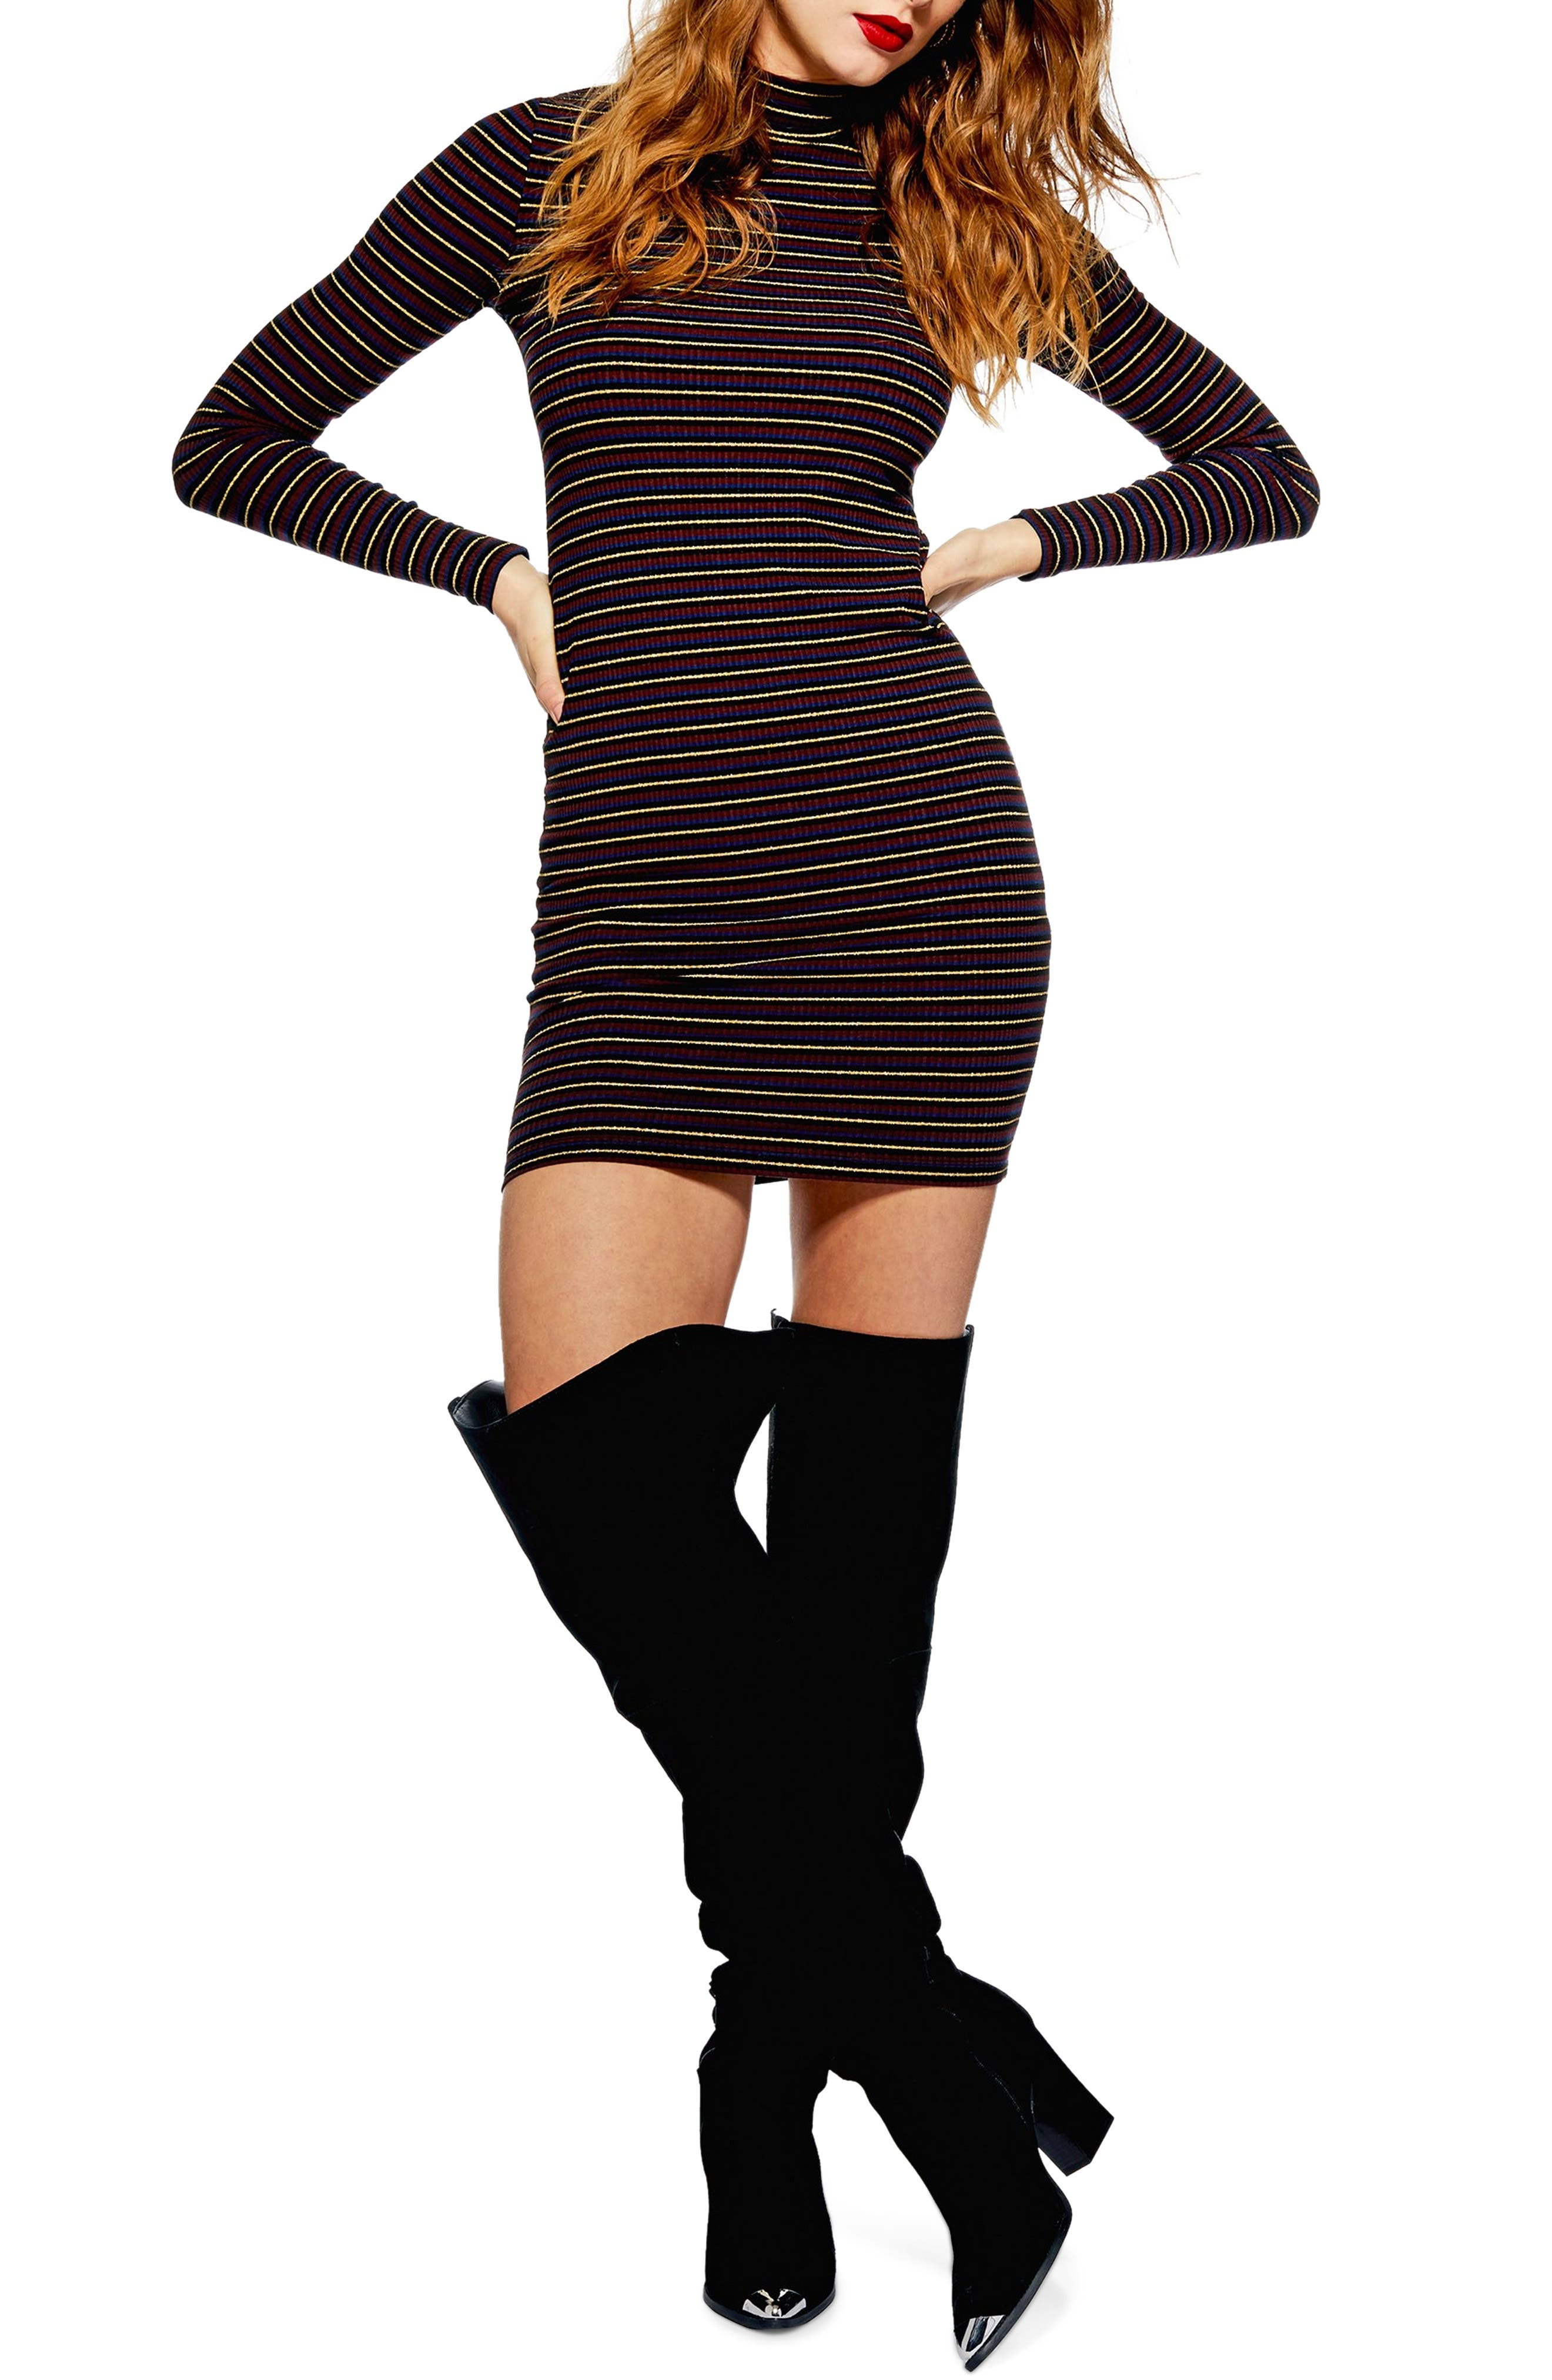 Topshop Stripe Knit Dress, US (fits like 2-4) - Burgundy